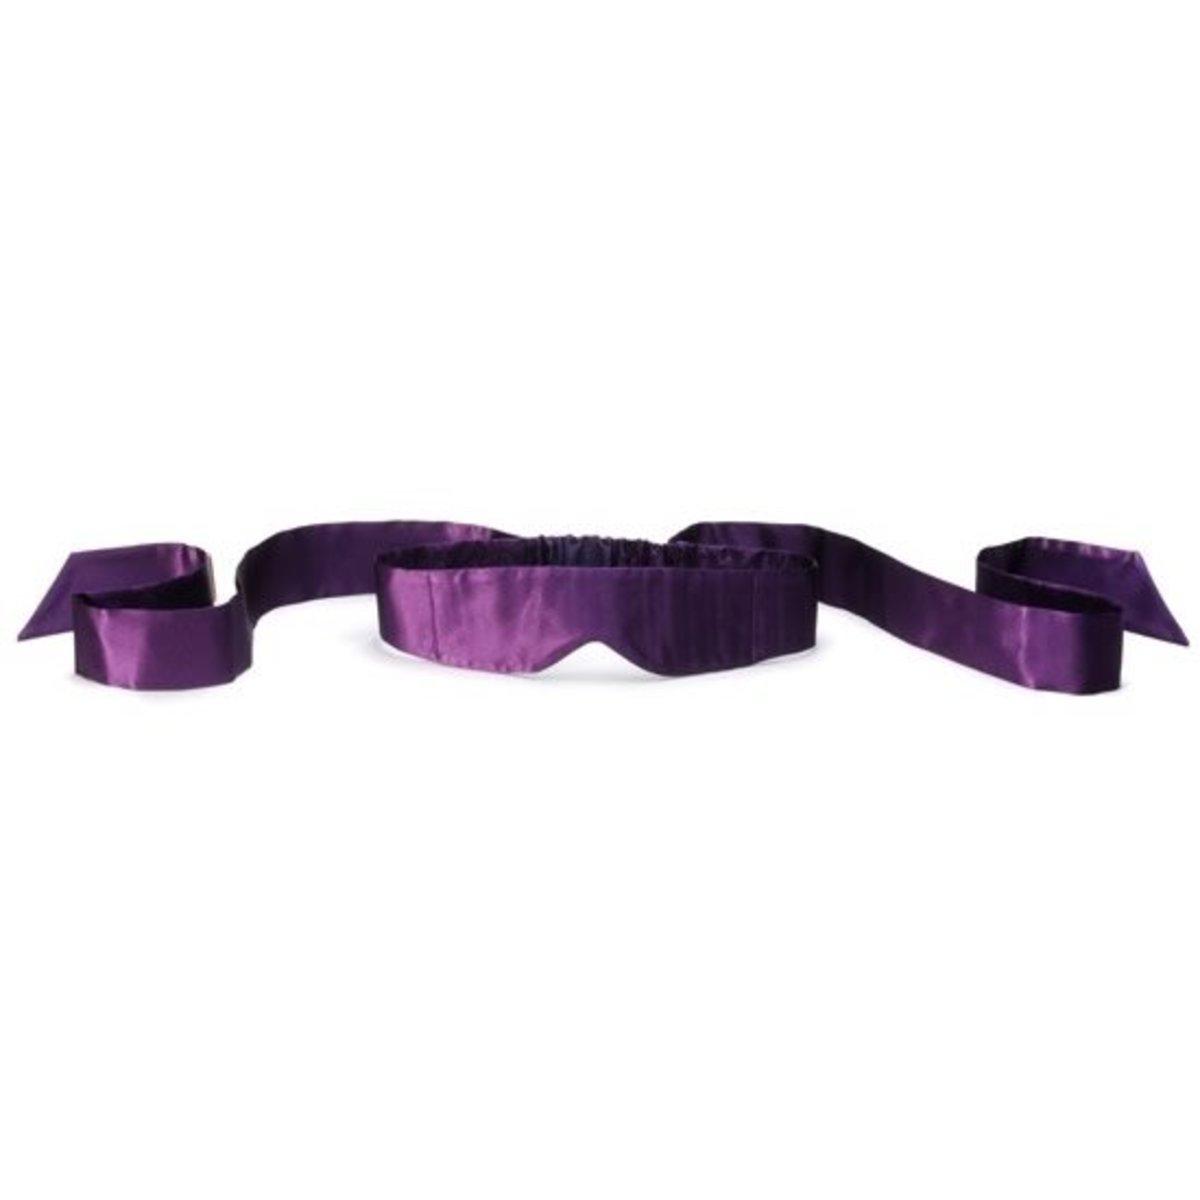 全絲眼罩 Intima Silk Blindfold - 紫色